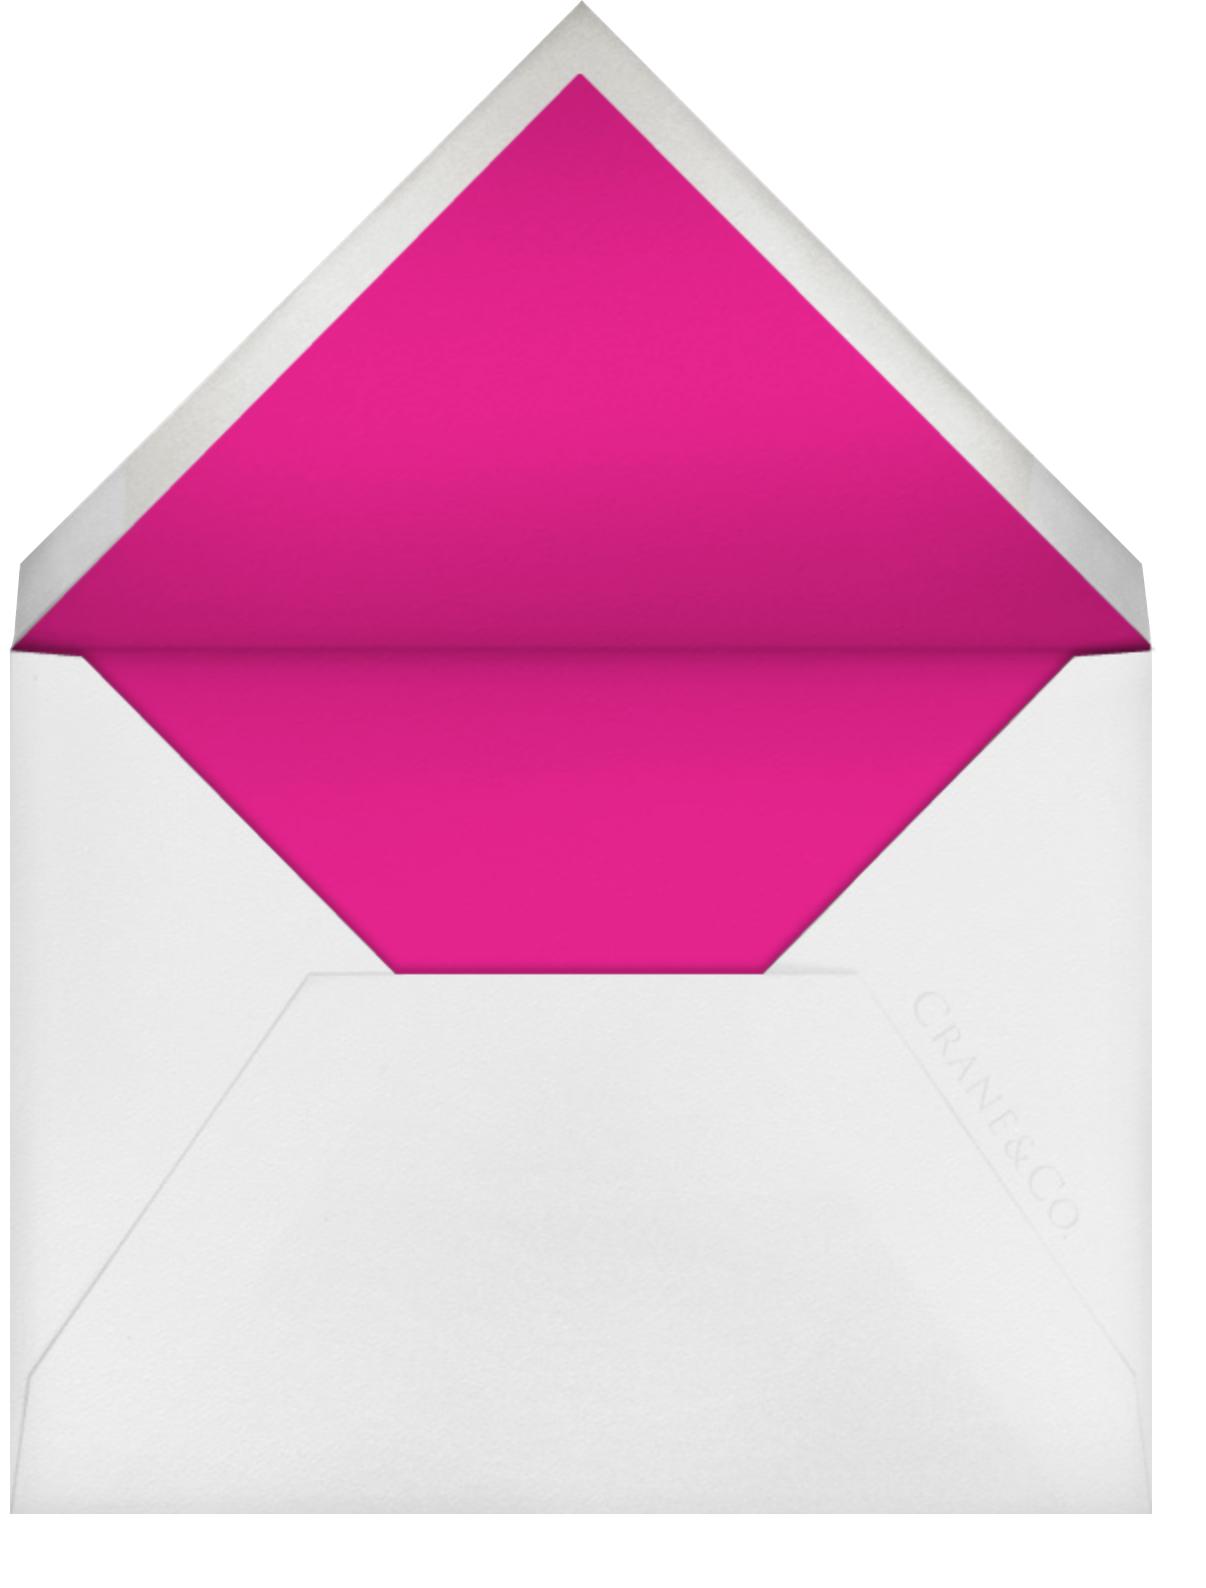 Silk Brocade I (Save the Date) - Raspberry - Oscar de la Renta - Envelope